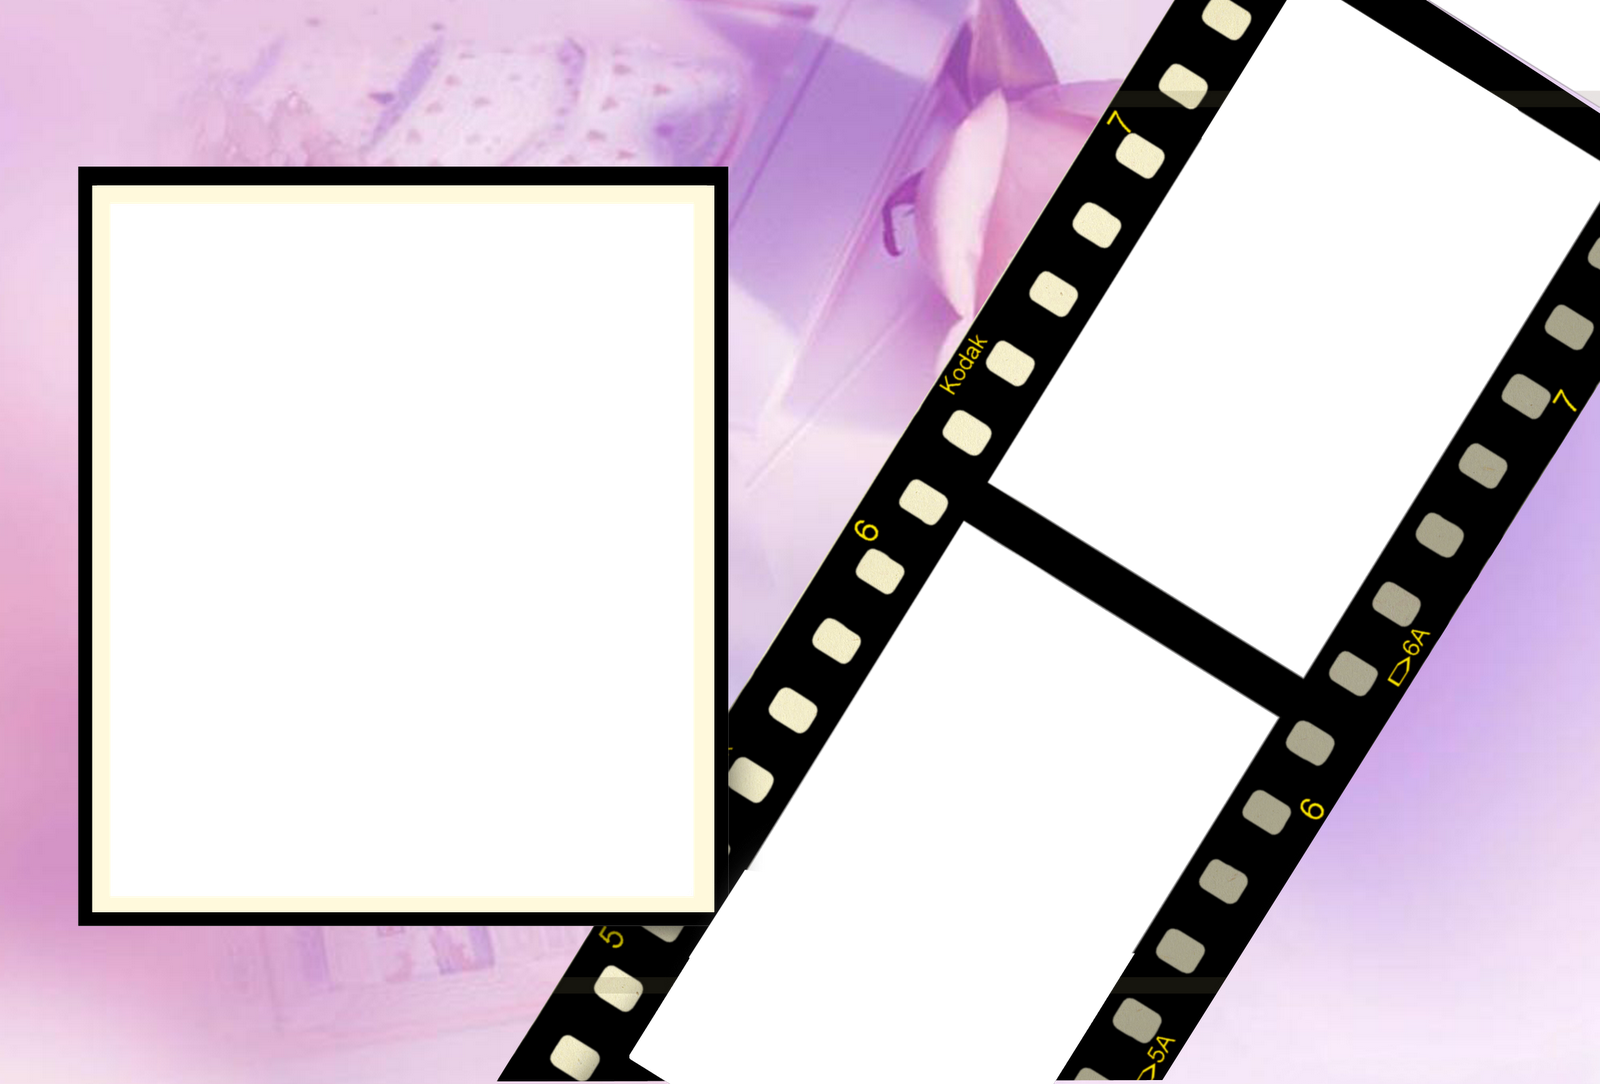 Albums Frames Engagement Frames Love Frames Marriags Wedding Full Size Png Download Seekpng